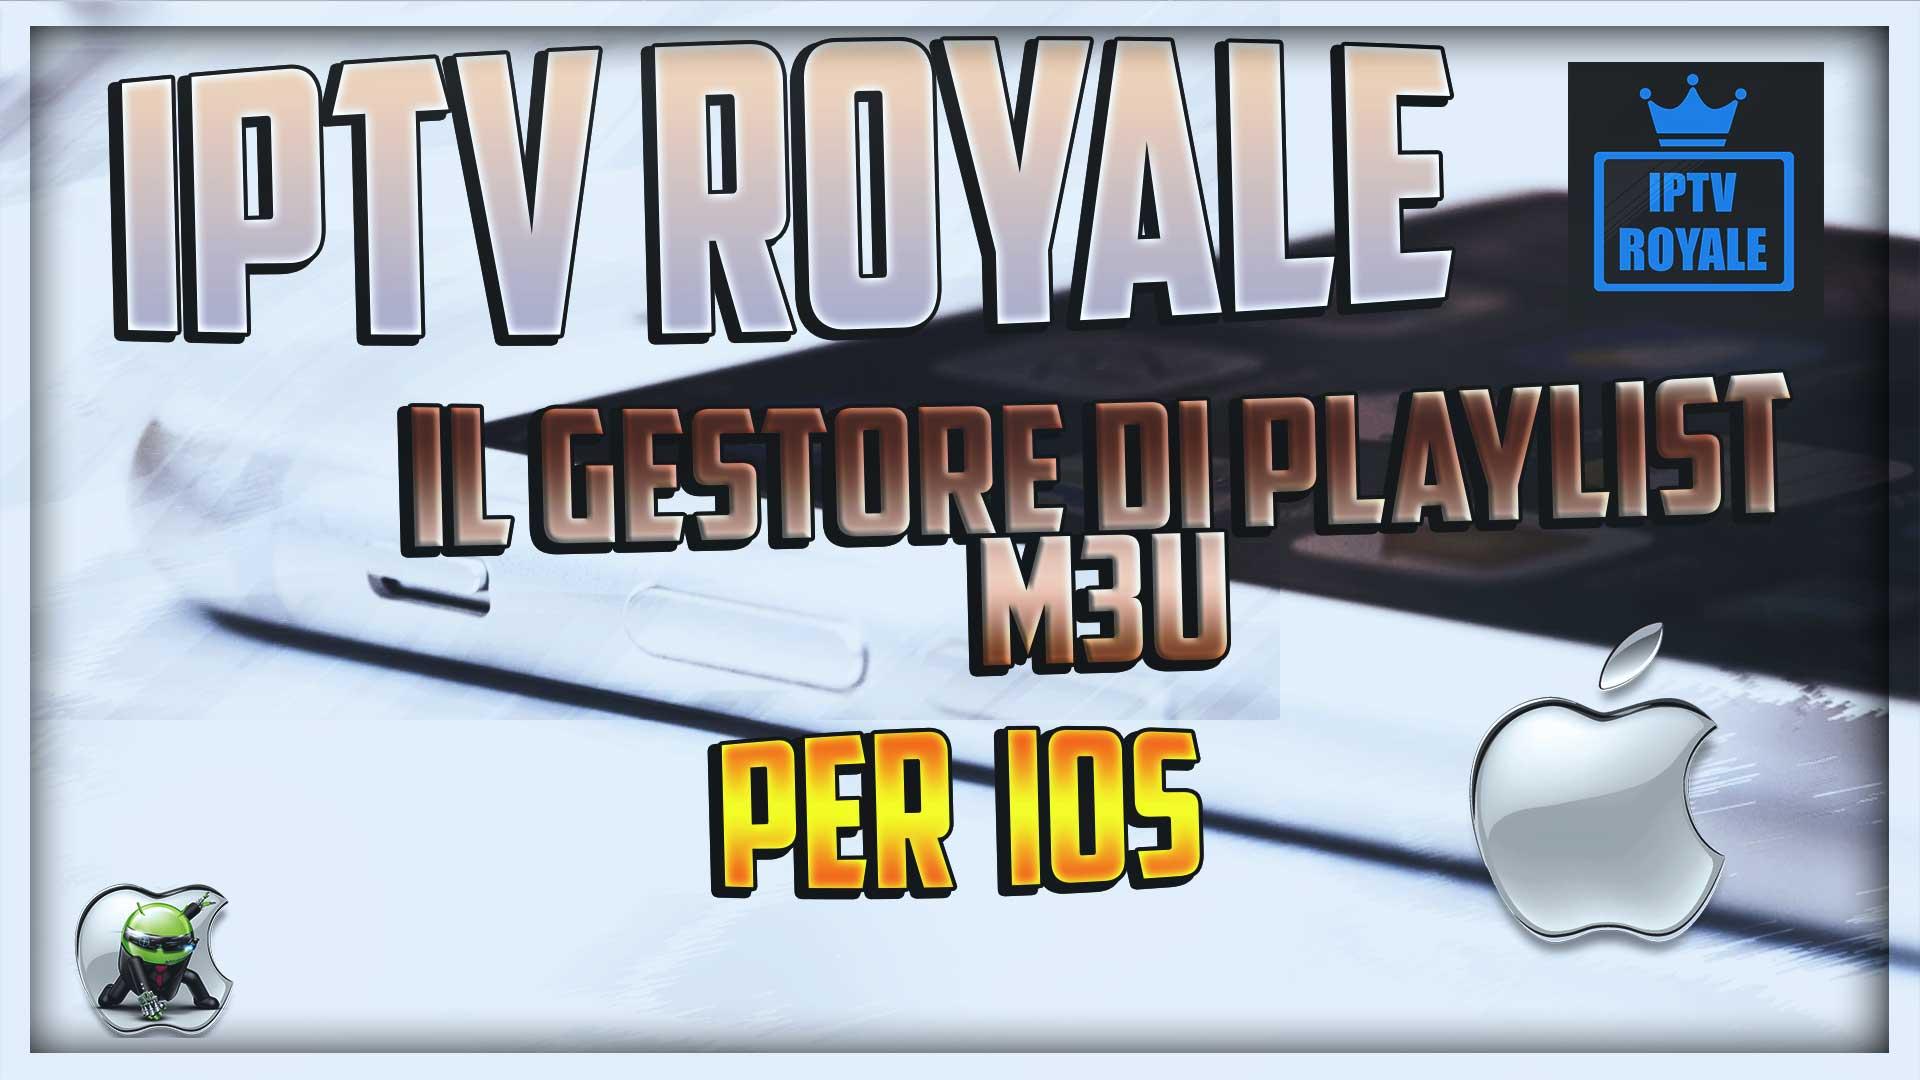 IPTV Royale